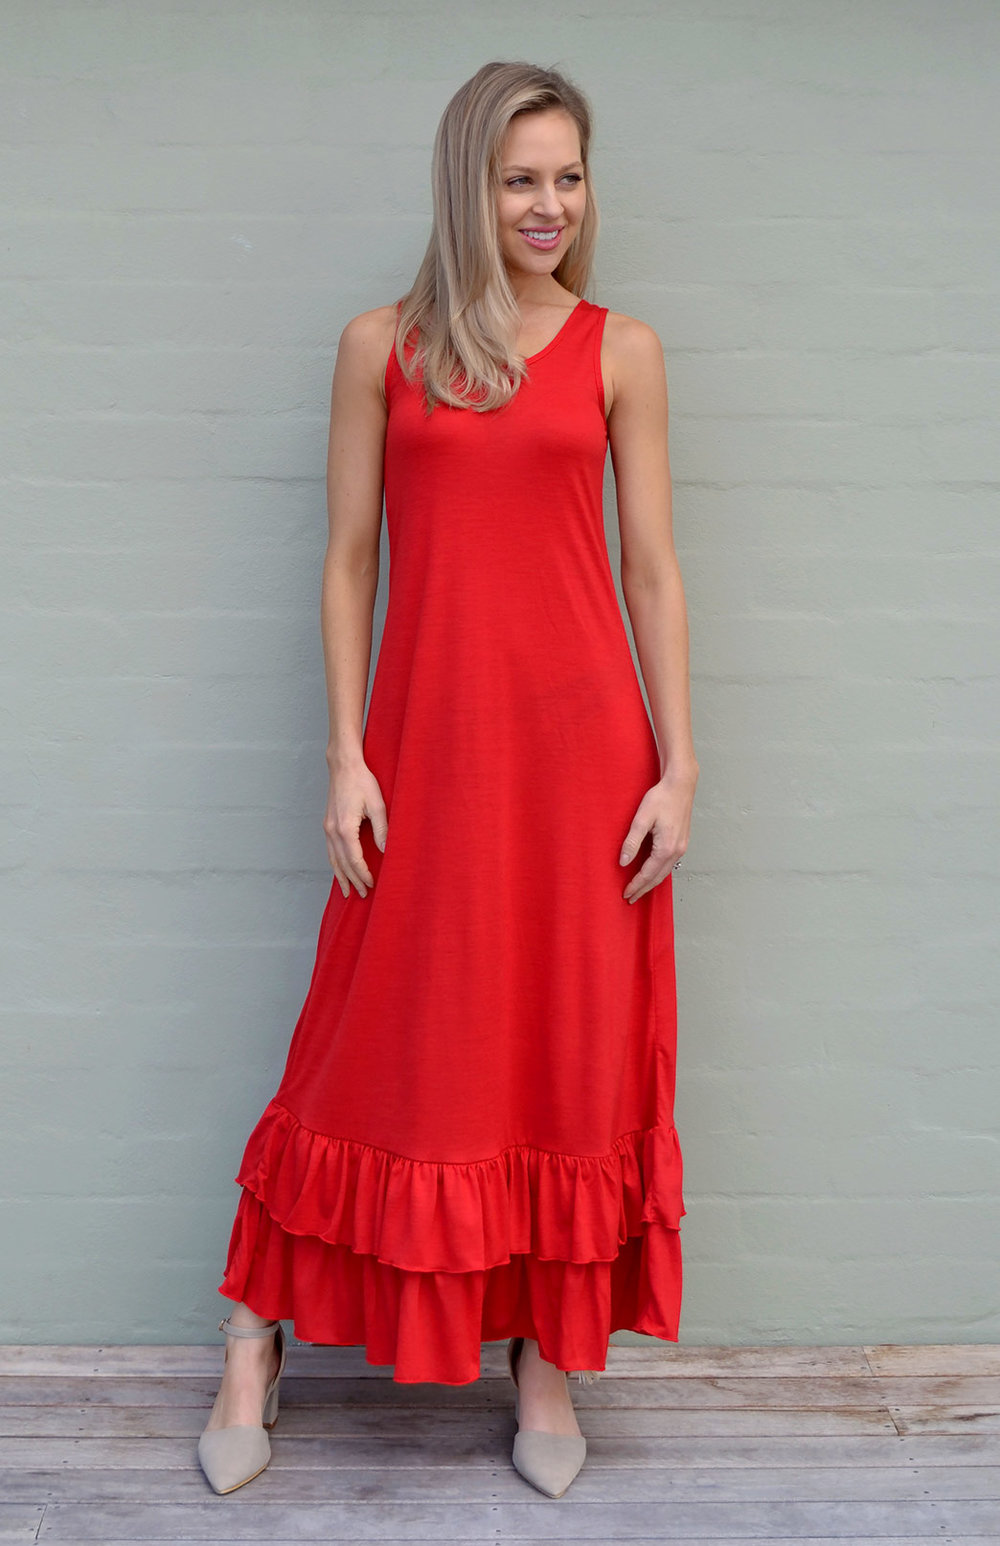 8546-sofia-dress-infra-red-1.jpg